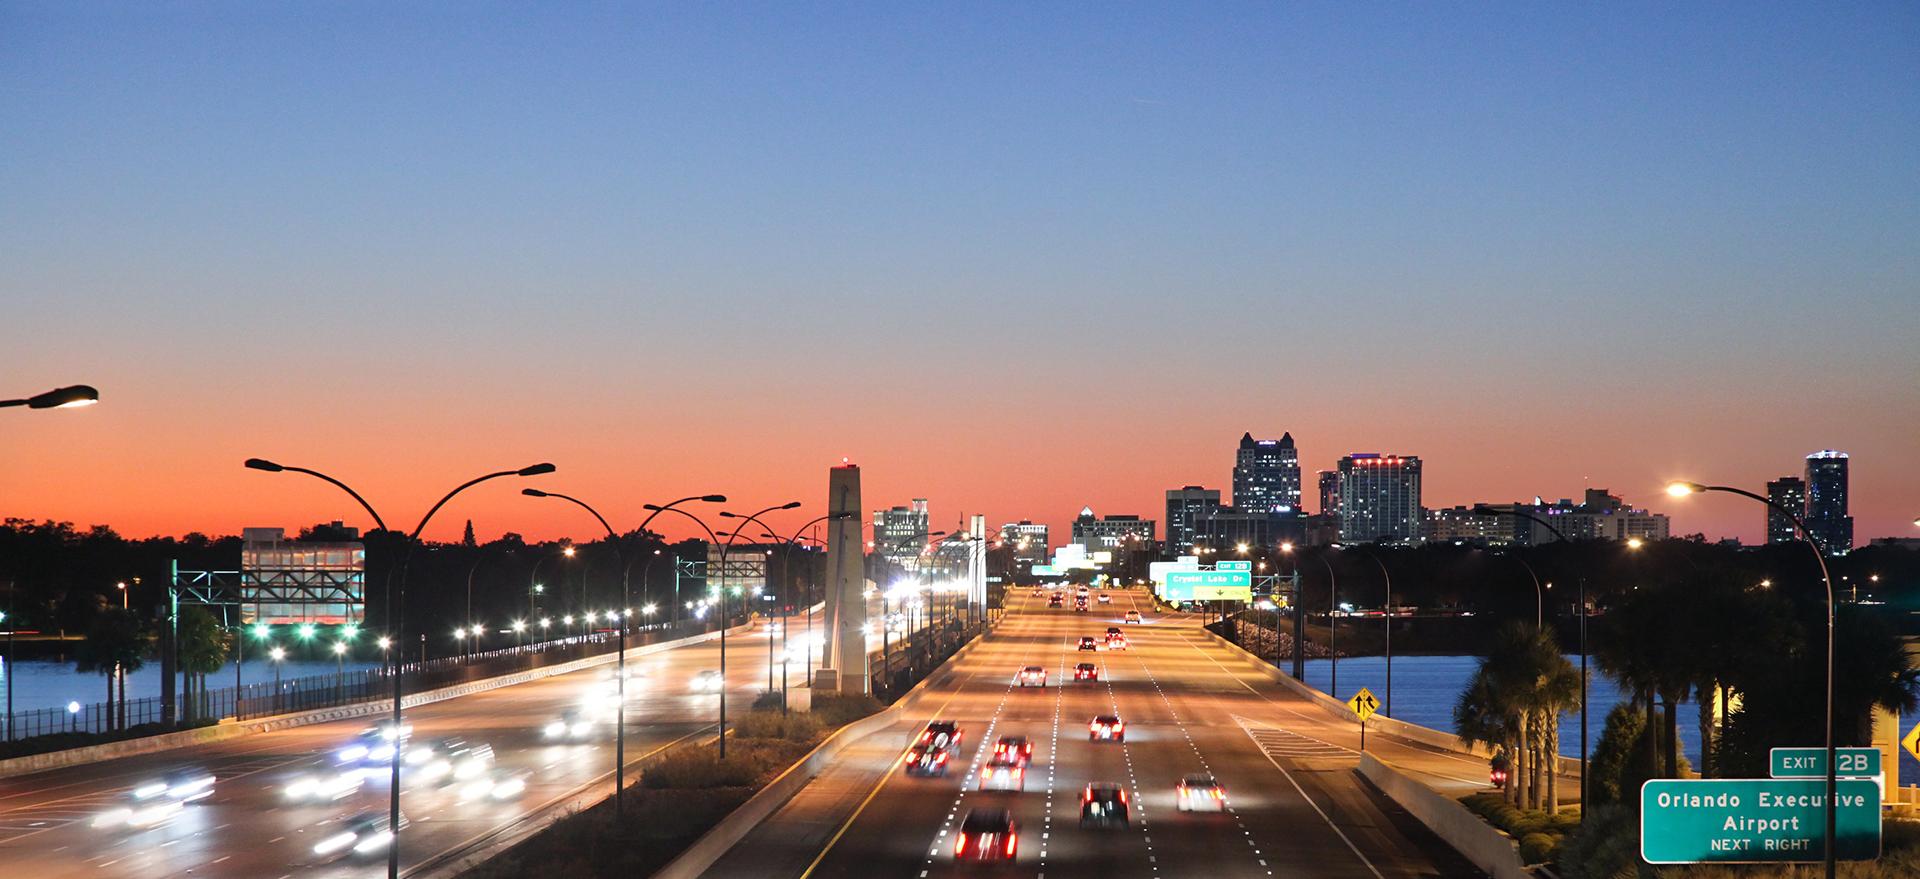 408 Expressway at twilight